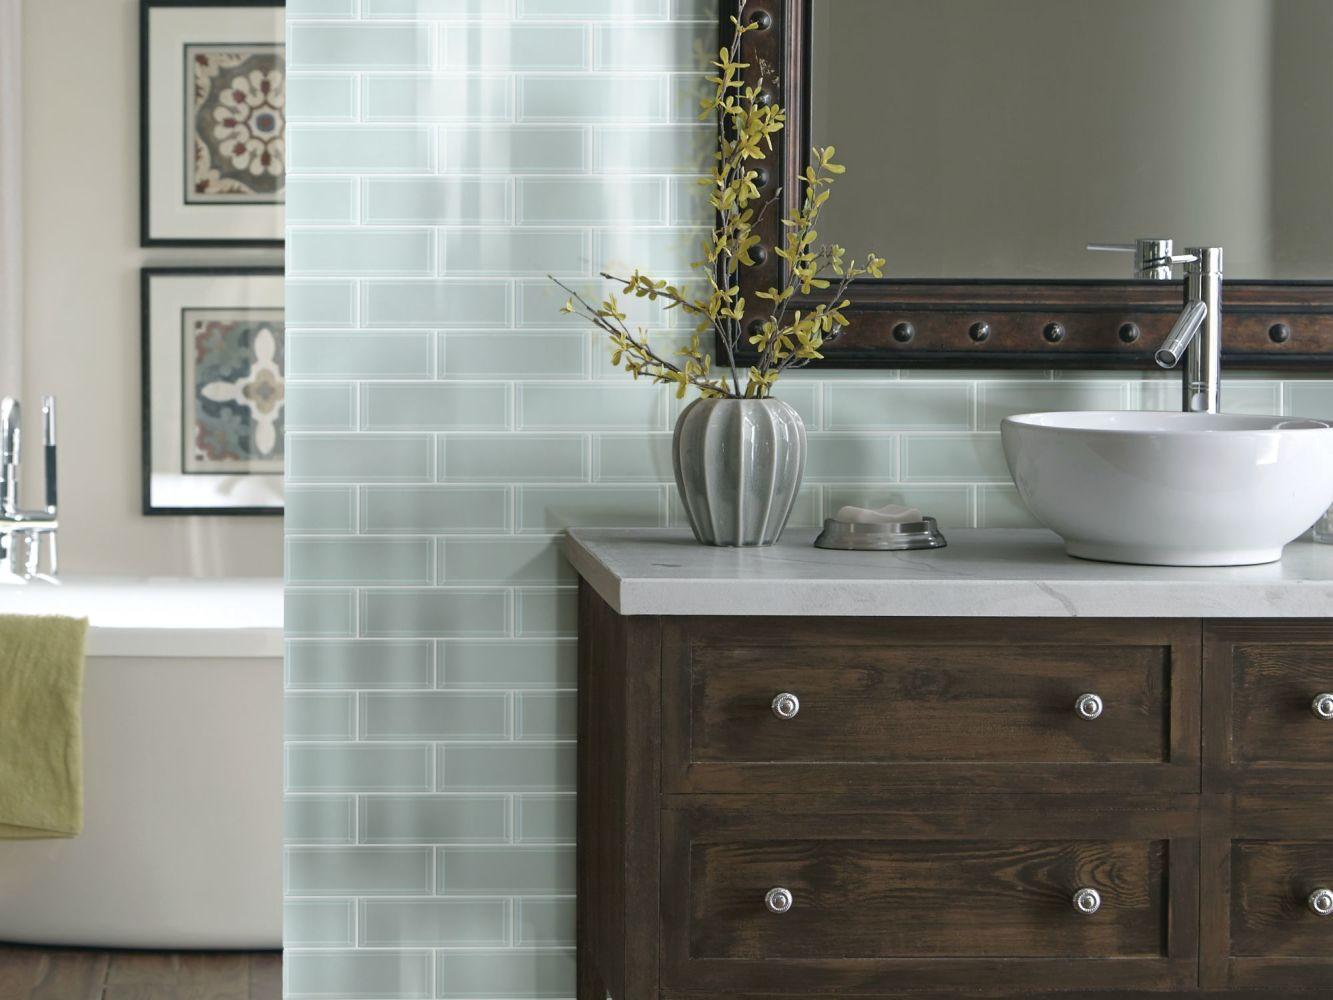 Shaw Floors Home Fn Gold Ceramic Principal 3×9 Beveled Glass Ti Cloud 00500_TG75B